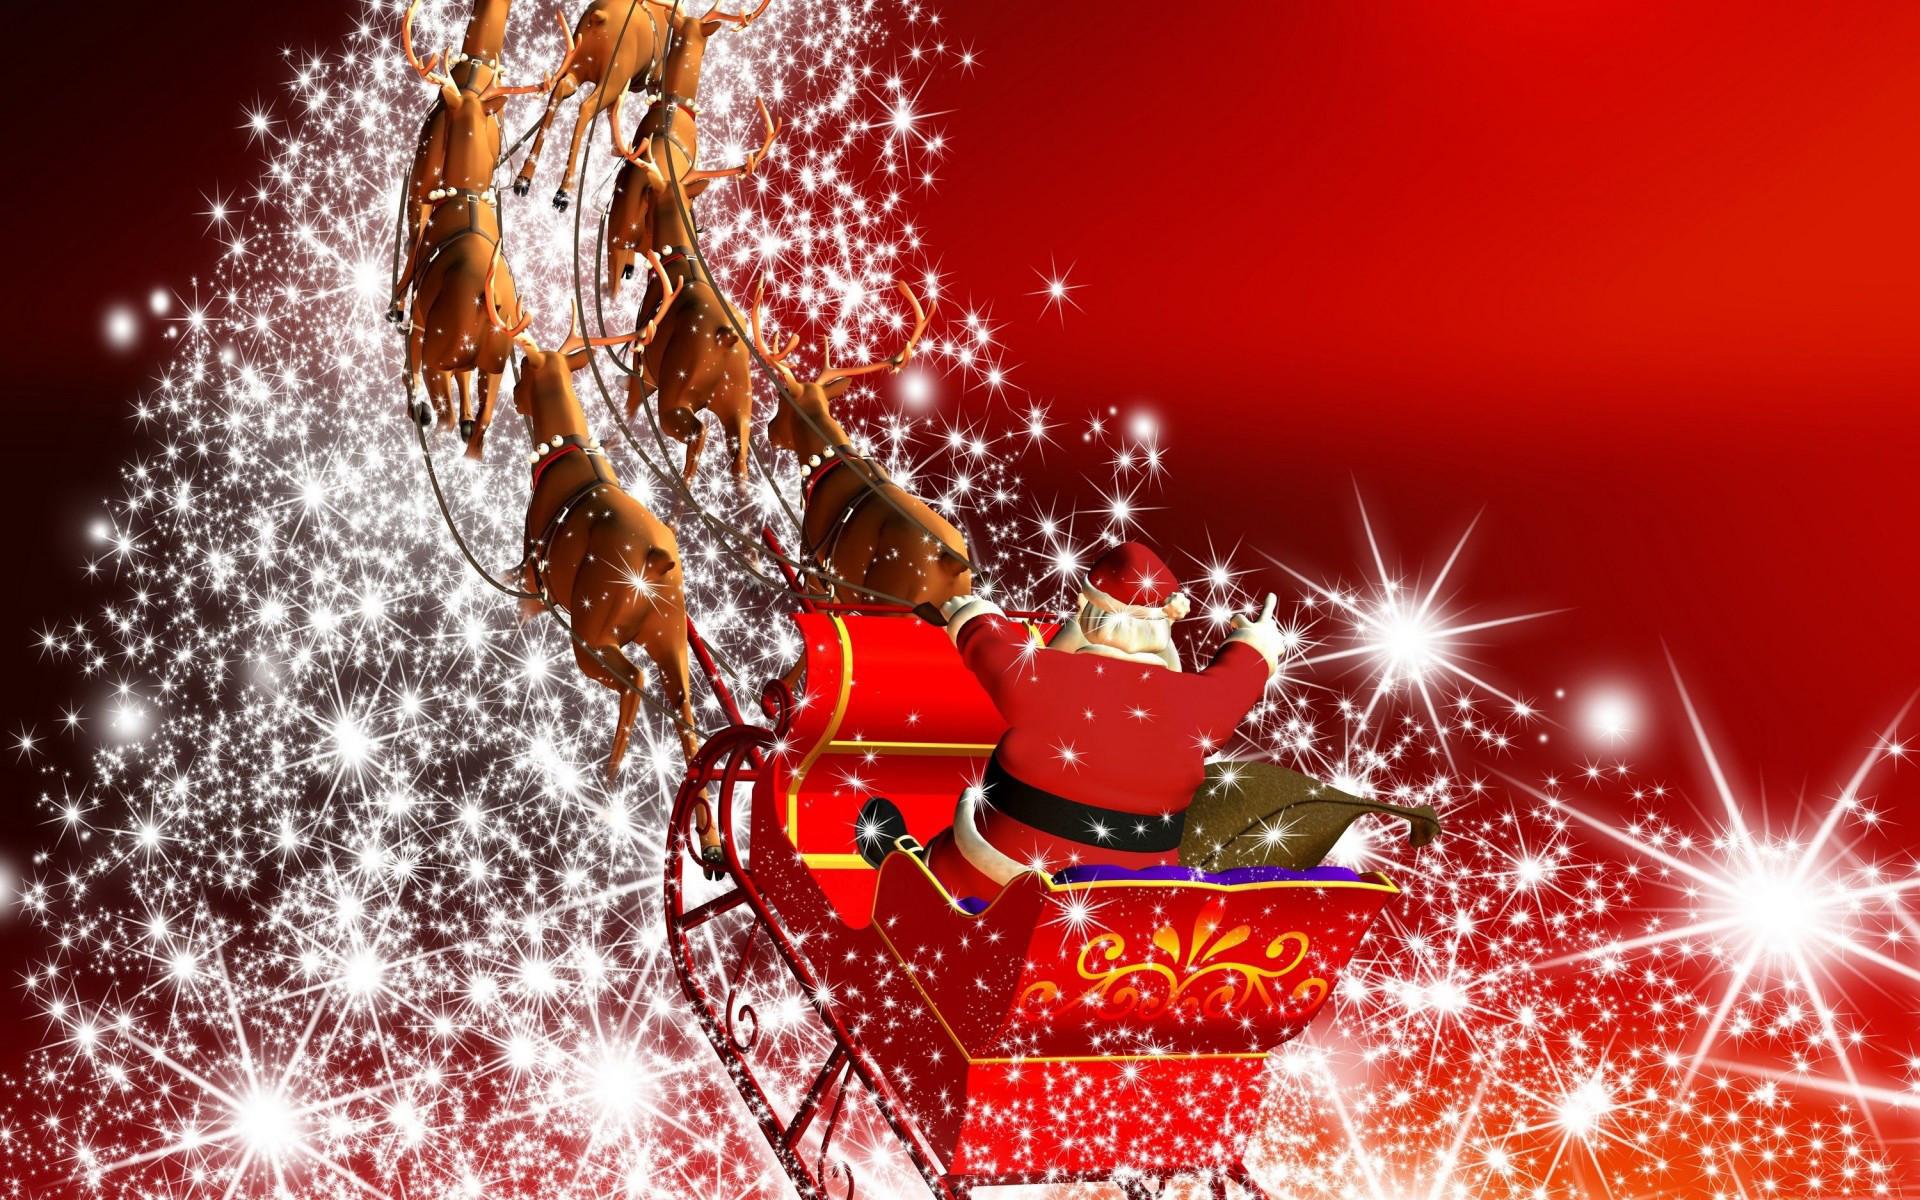 Santa Claus in harness racing away on Christmas